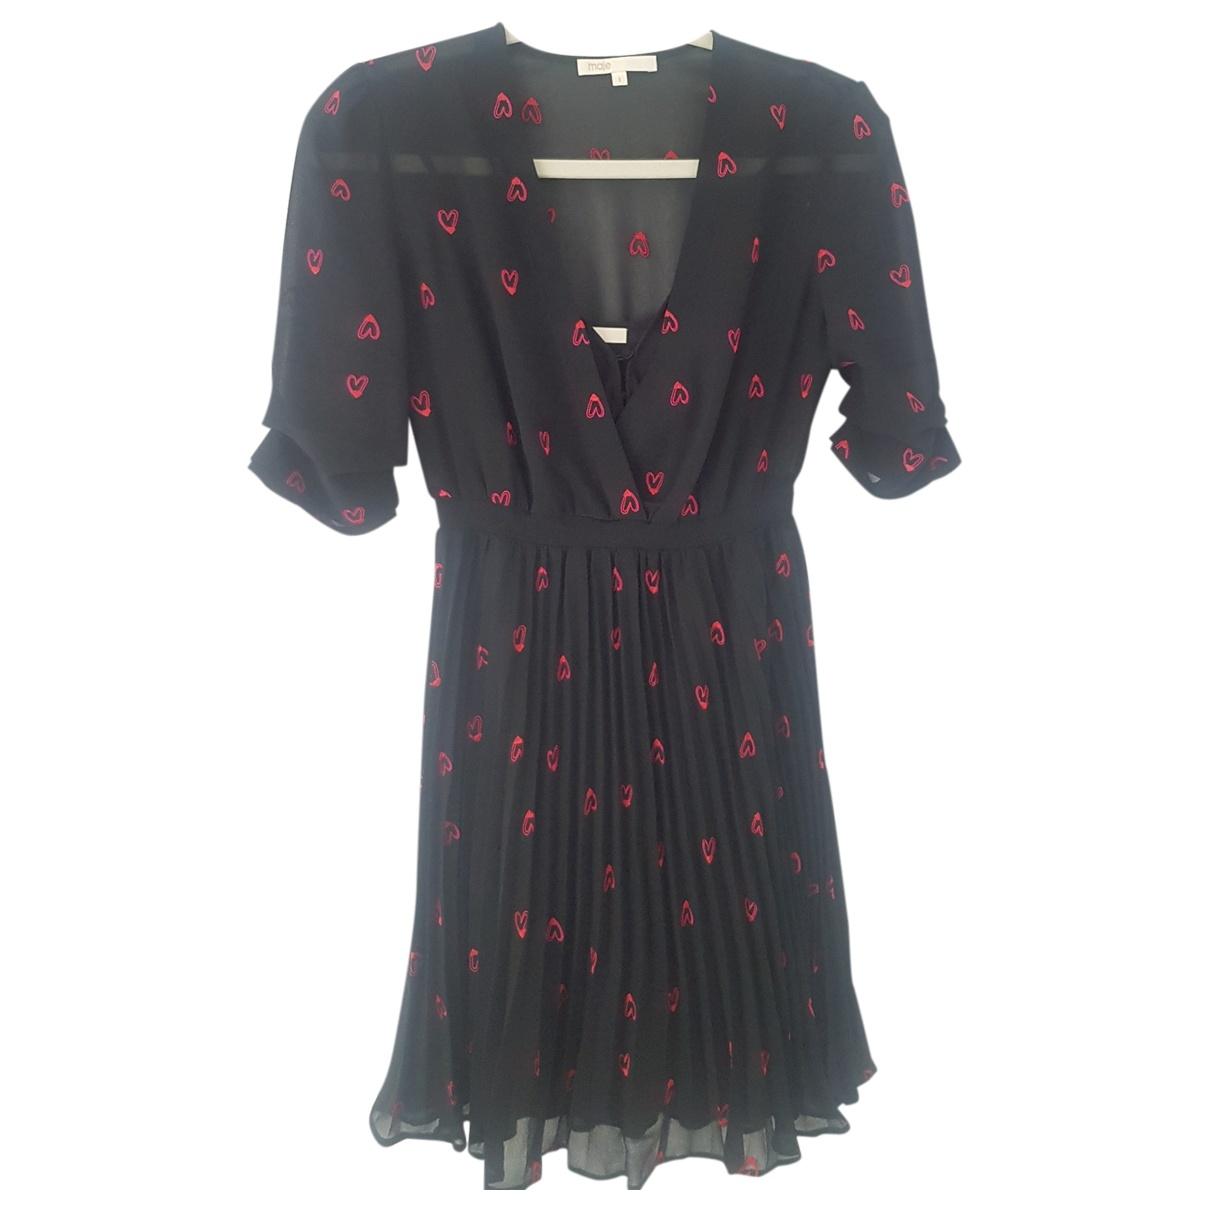 Maje Spring Summer 2019 Black dress for Women 34 FR